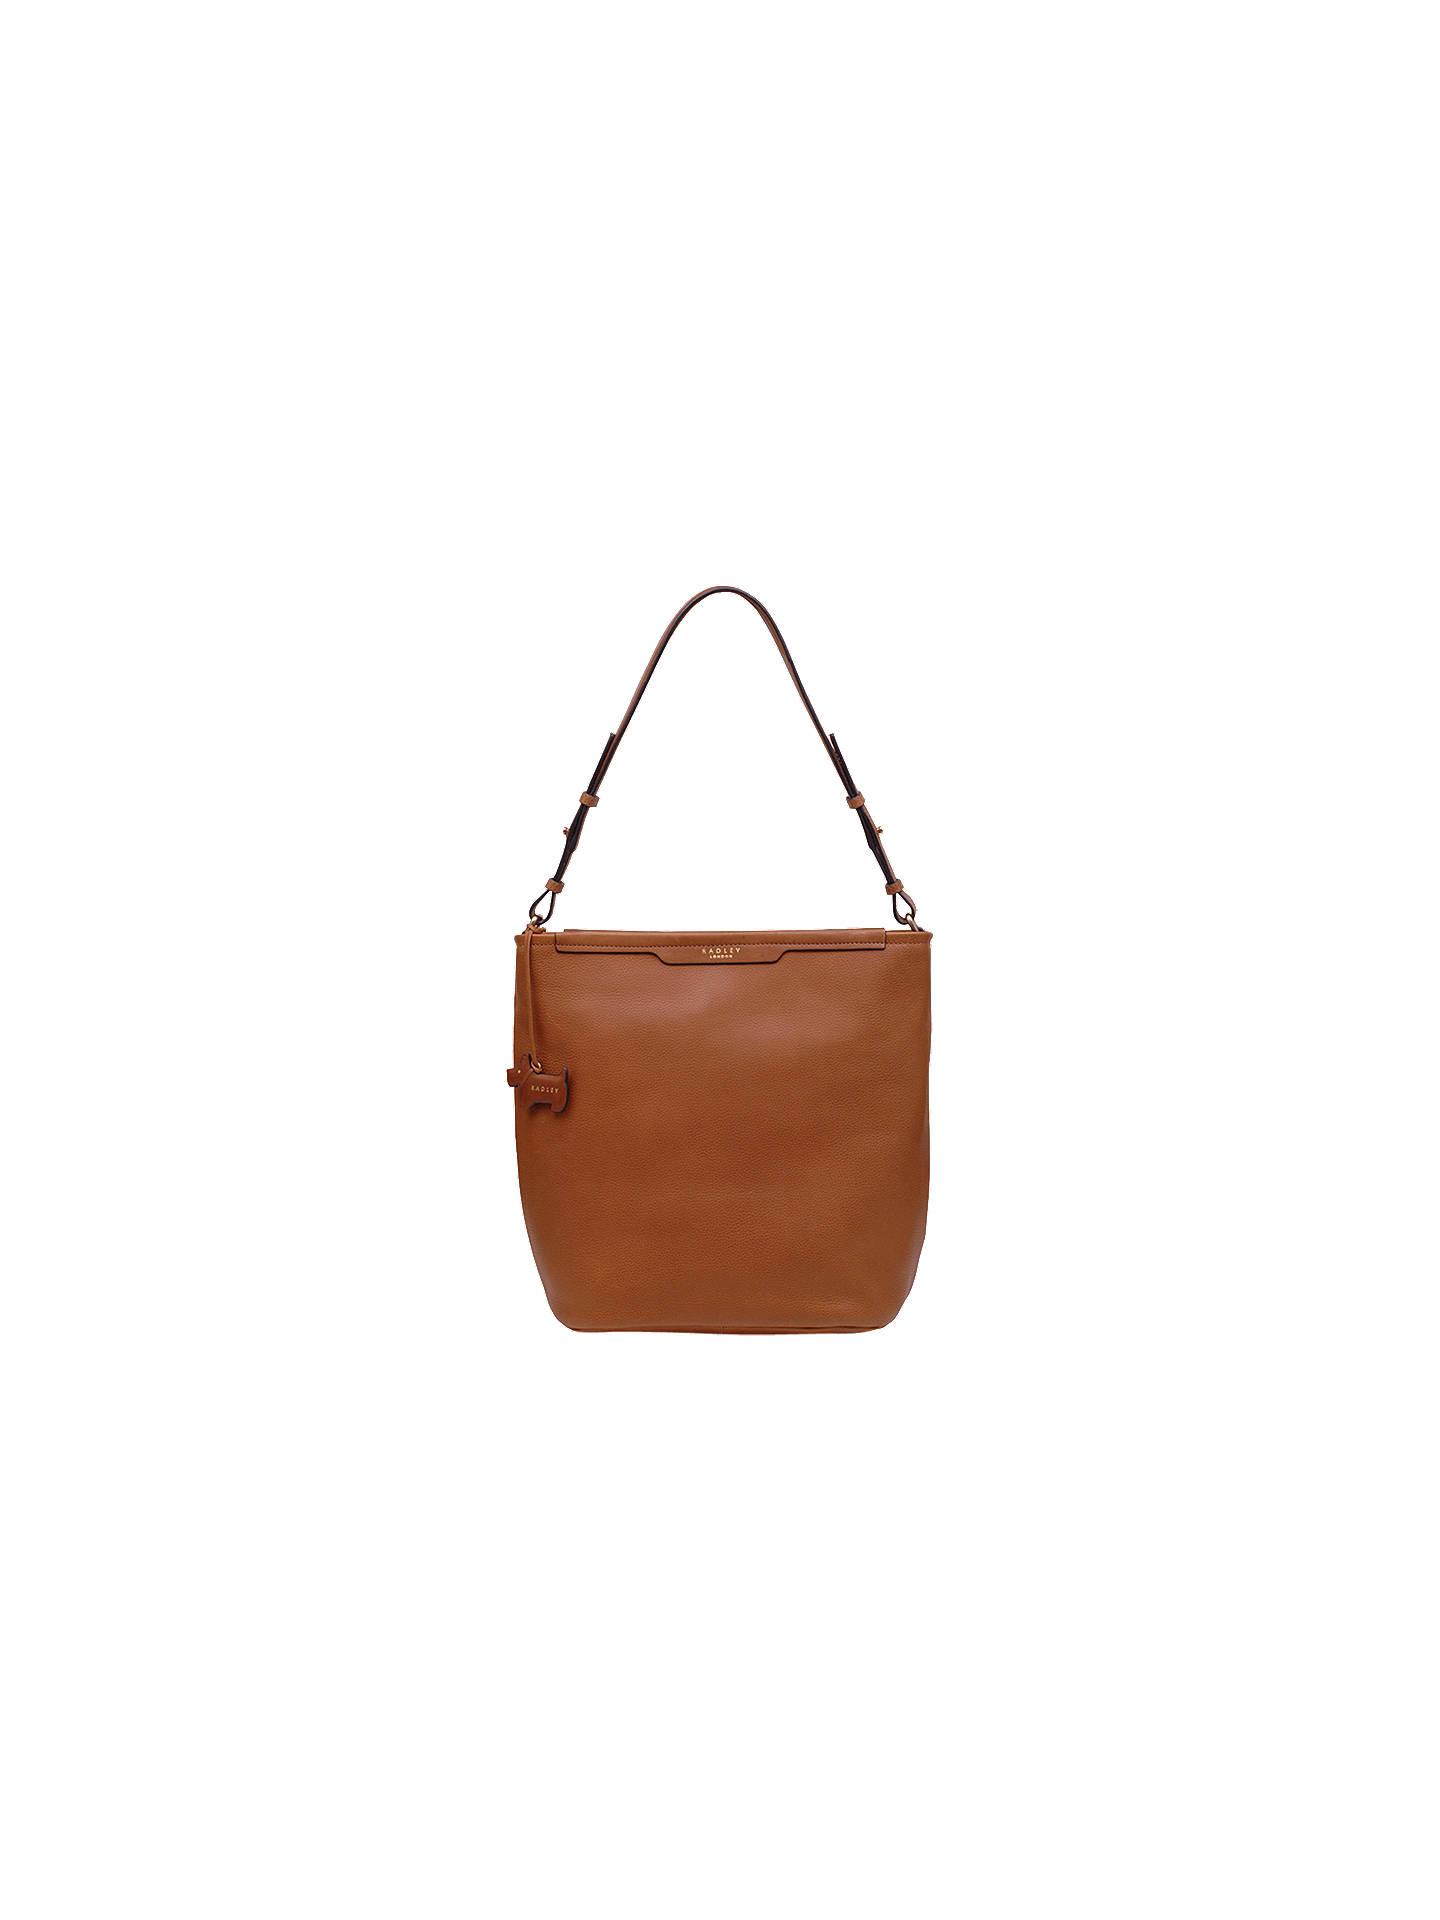 cb4a4f4f2595 Radley Medium Leather Hobo Bag at John Lewis   Partners